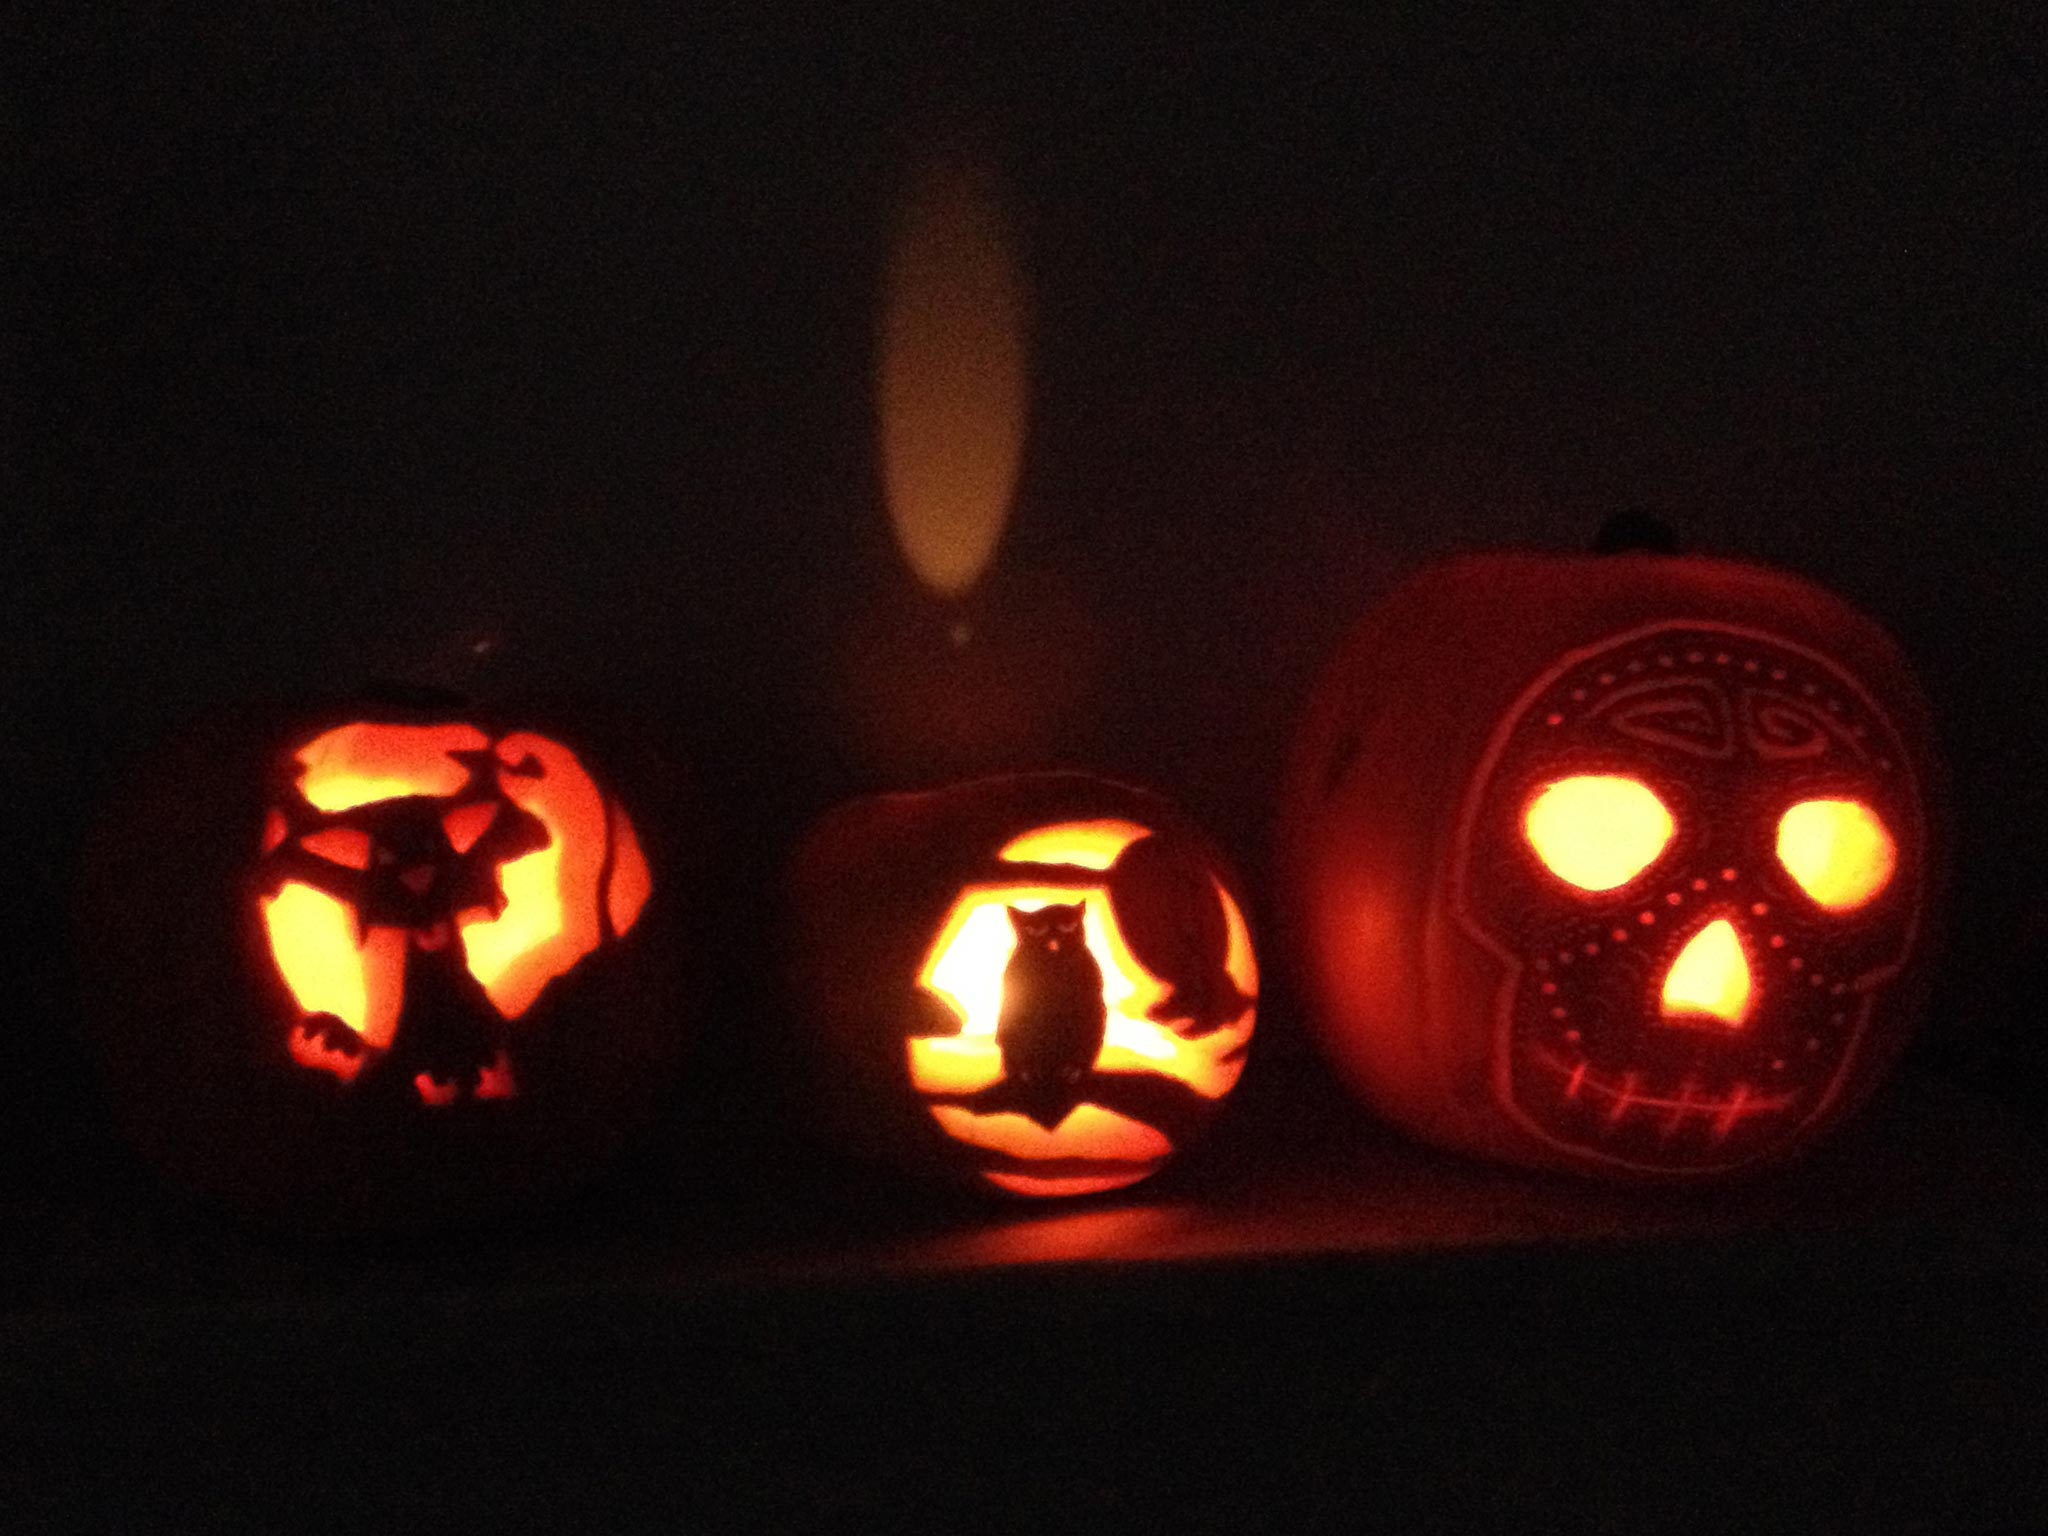 in pictures: readers' halloween pumpkin designs | the independent